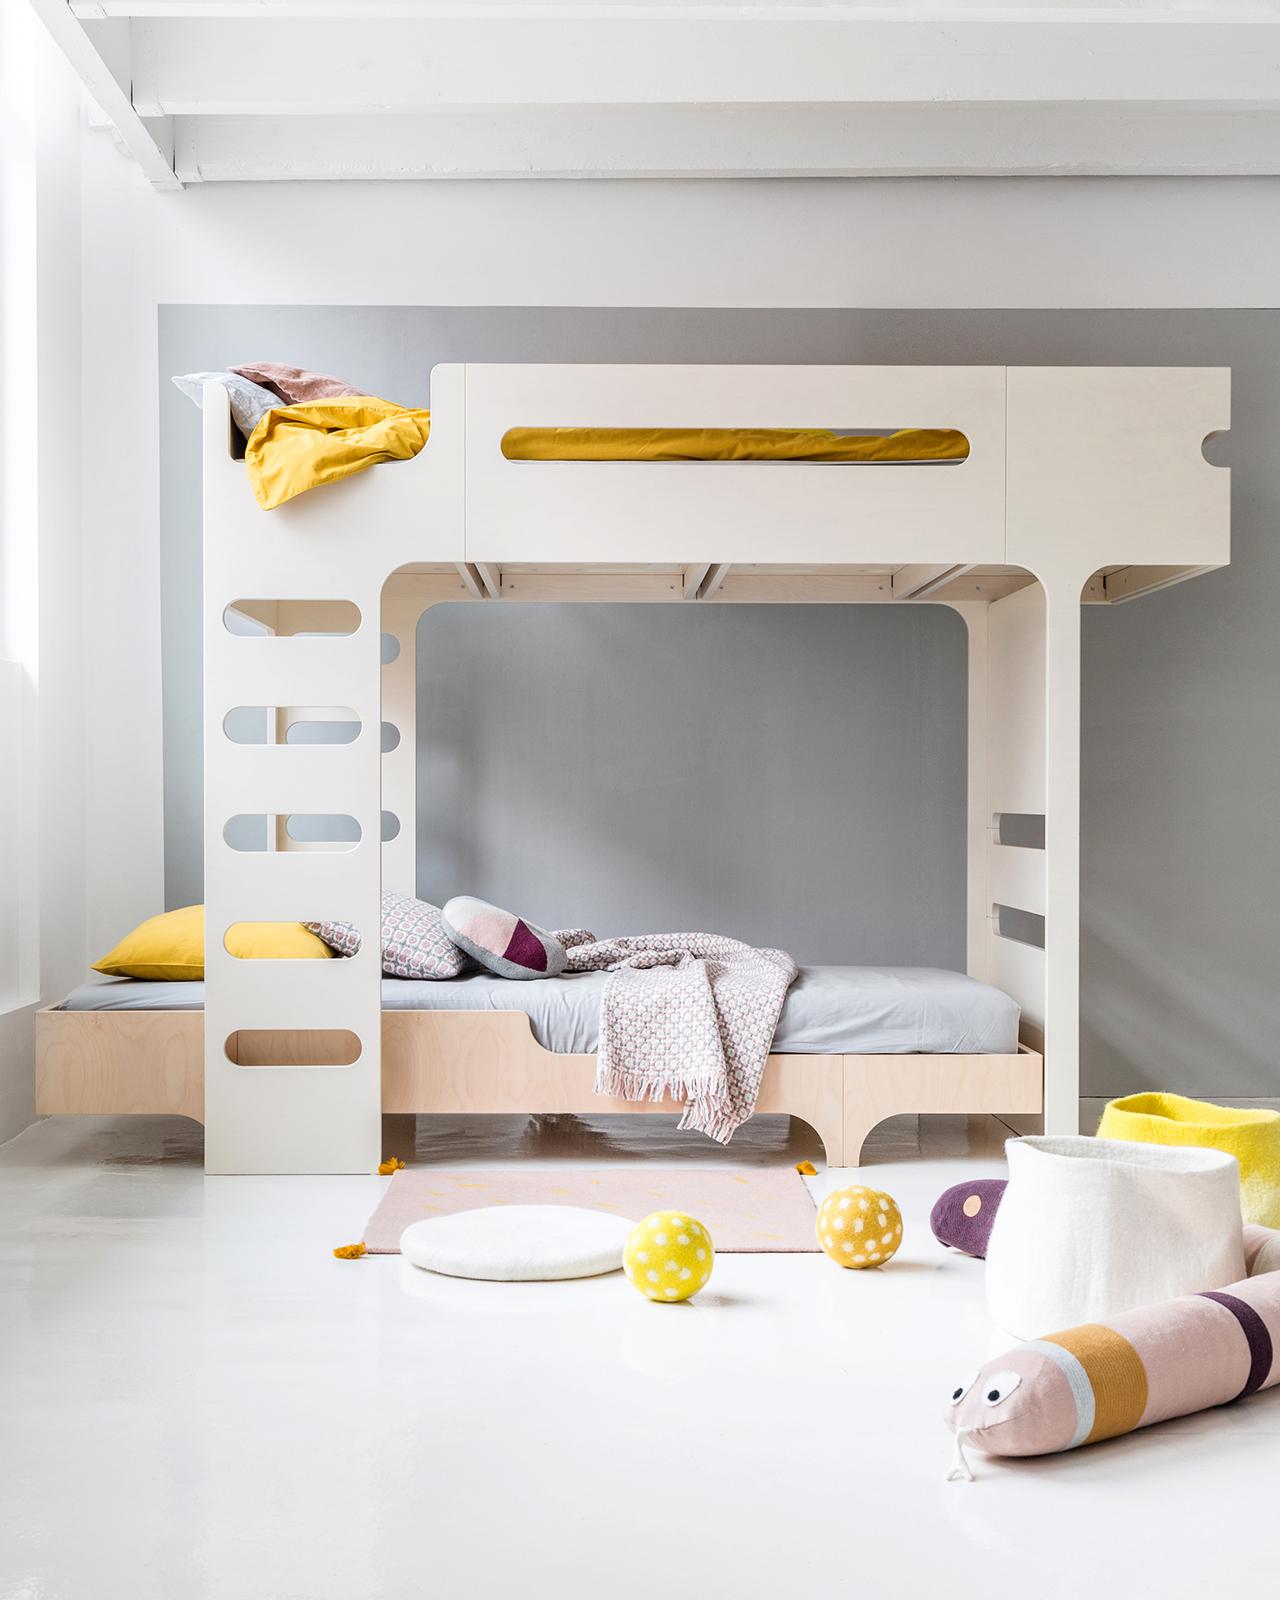 F&A75 Bunk Bed for 2 Children - Designer Furniture - Rafa-Kids